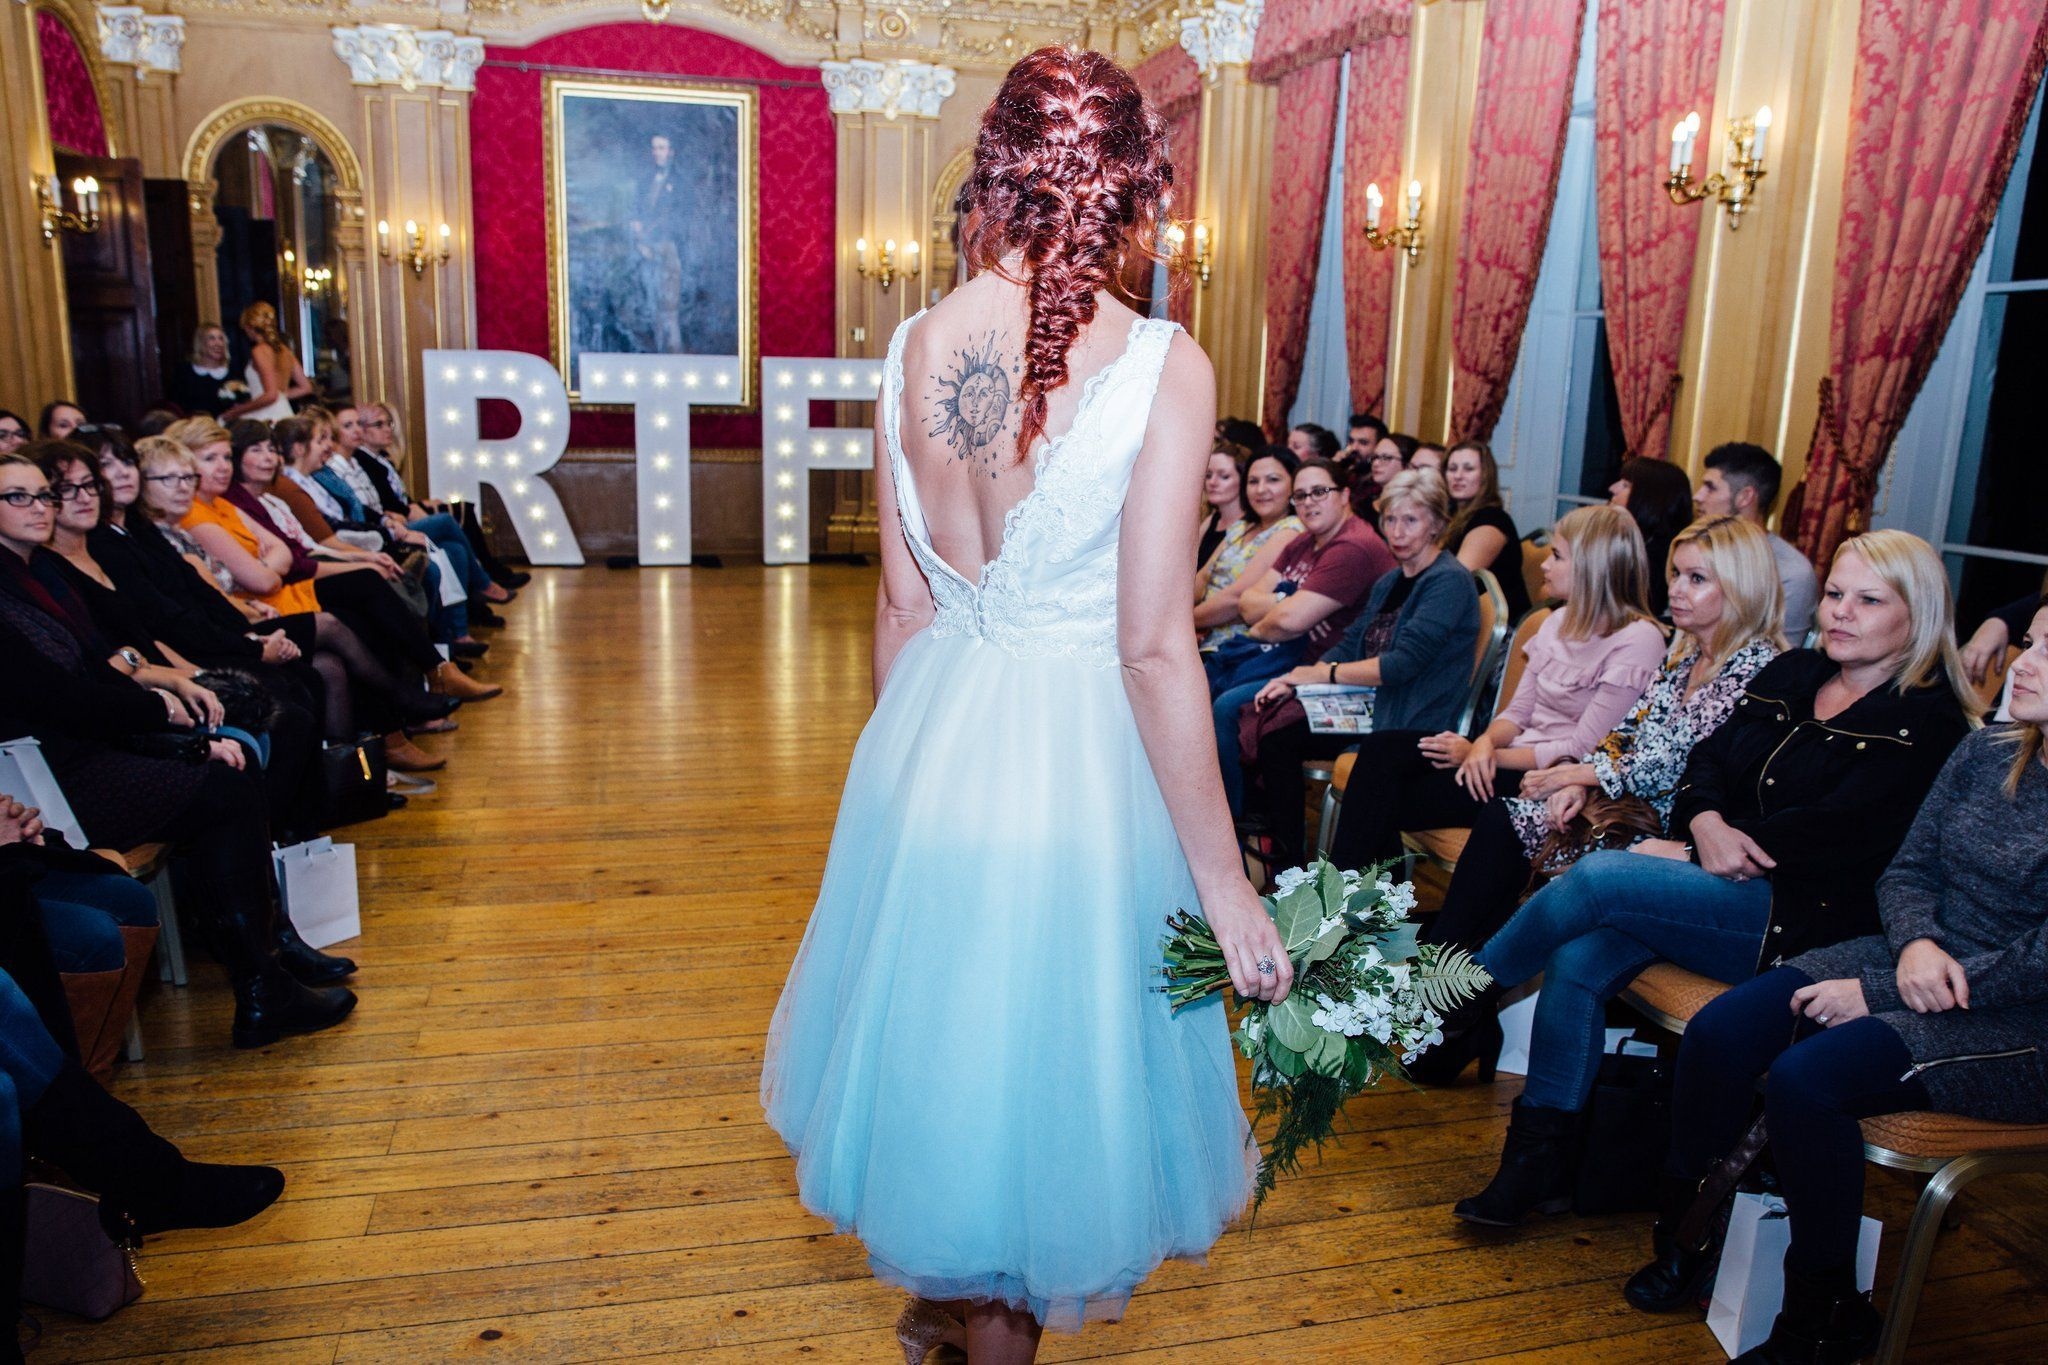 Hound dogu by lucy canut dance blue dip dye wedding dress with lace